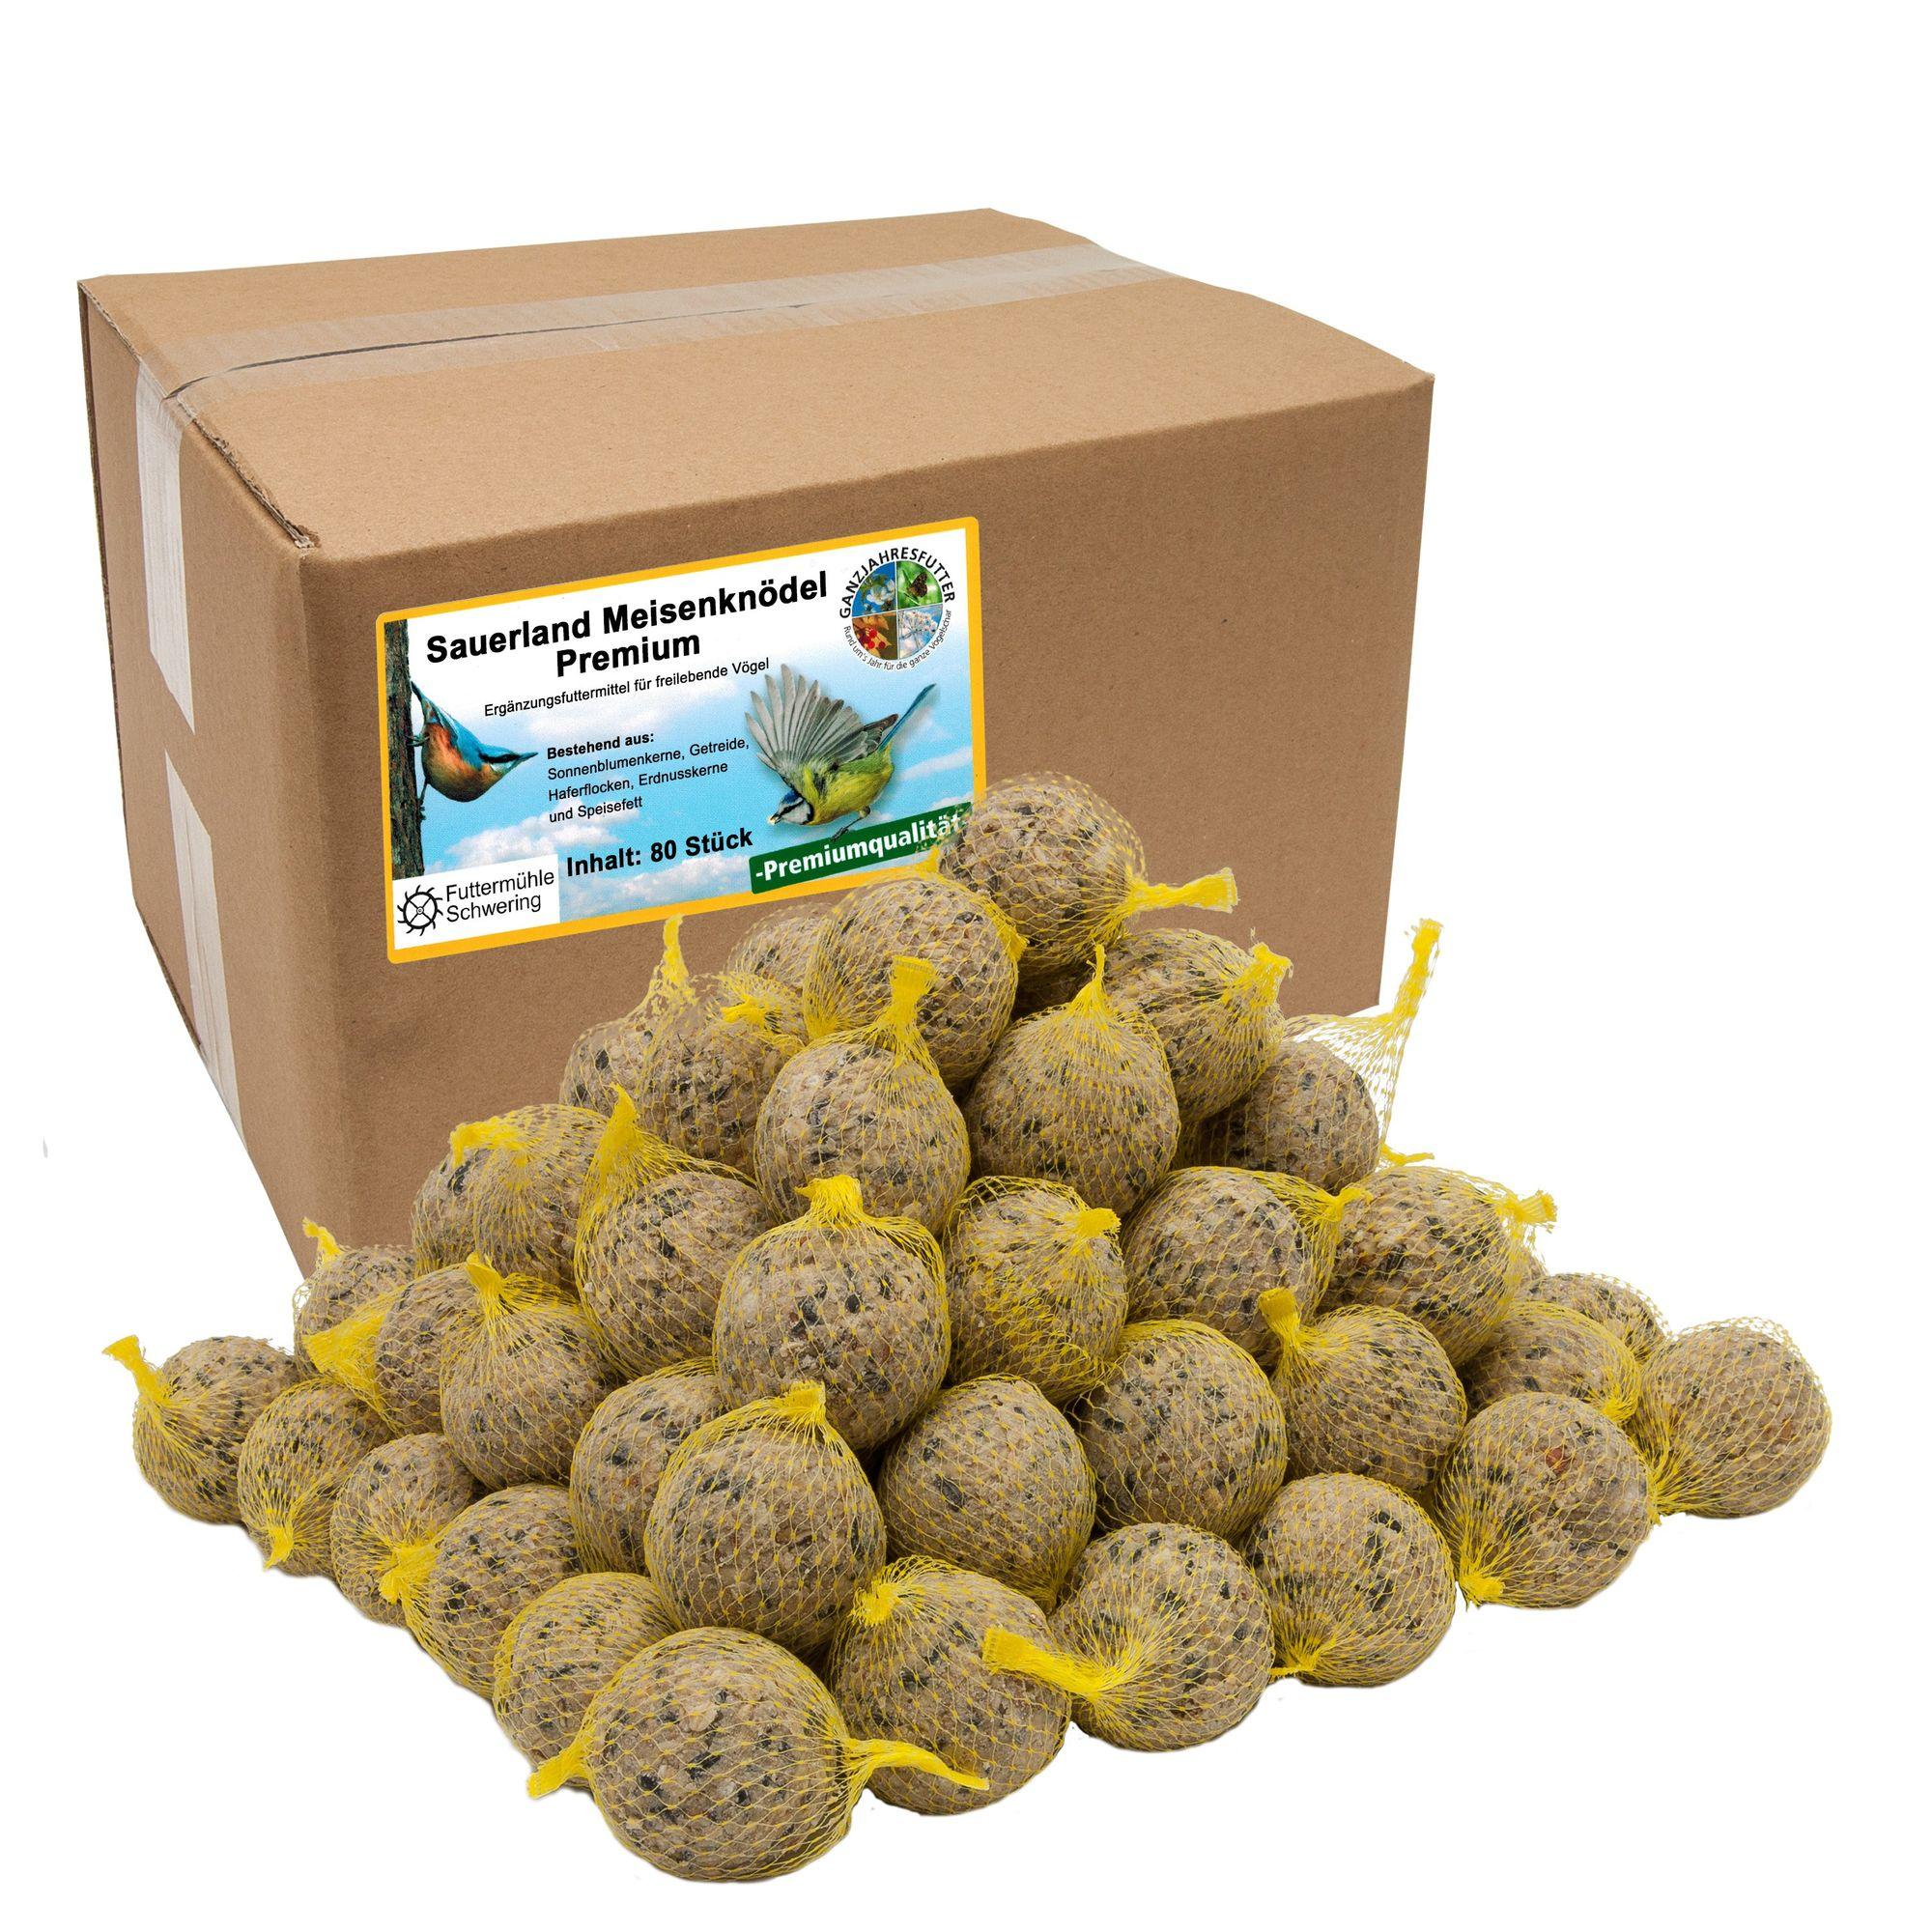 Sauerland-Premiumknödel 80 Stück im Karton